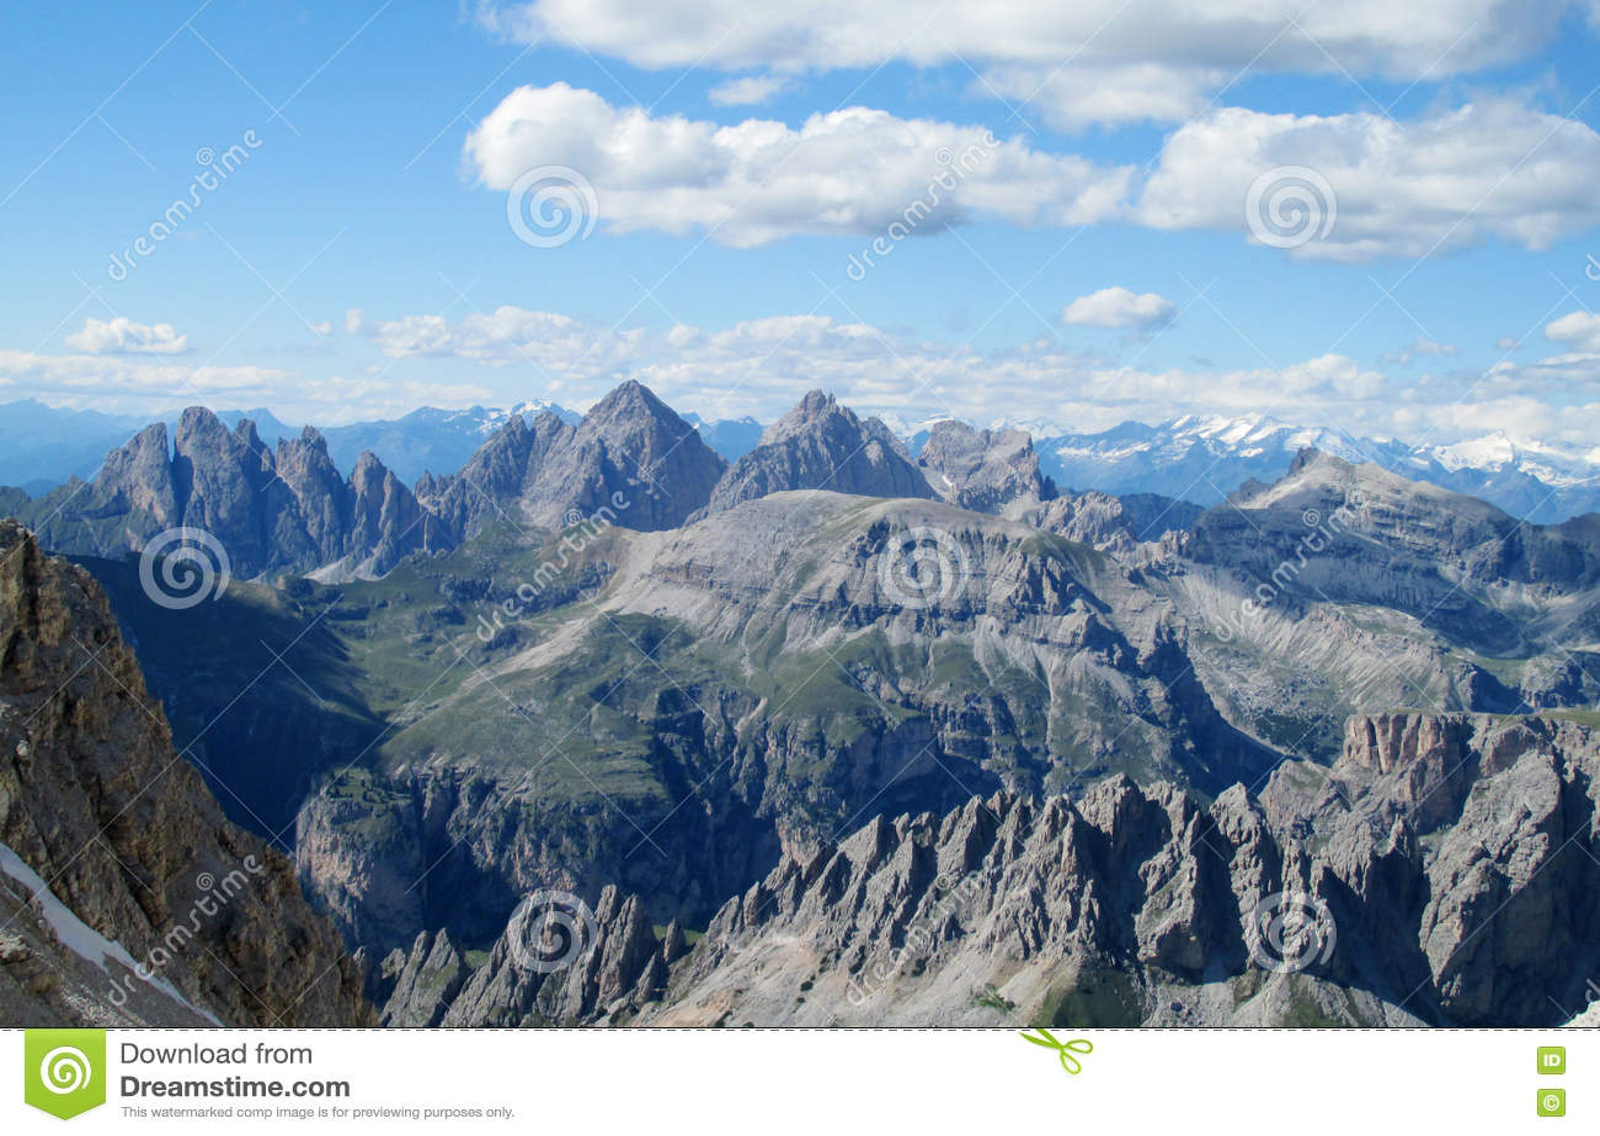 Dolomite Alps mountain rocky scenery